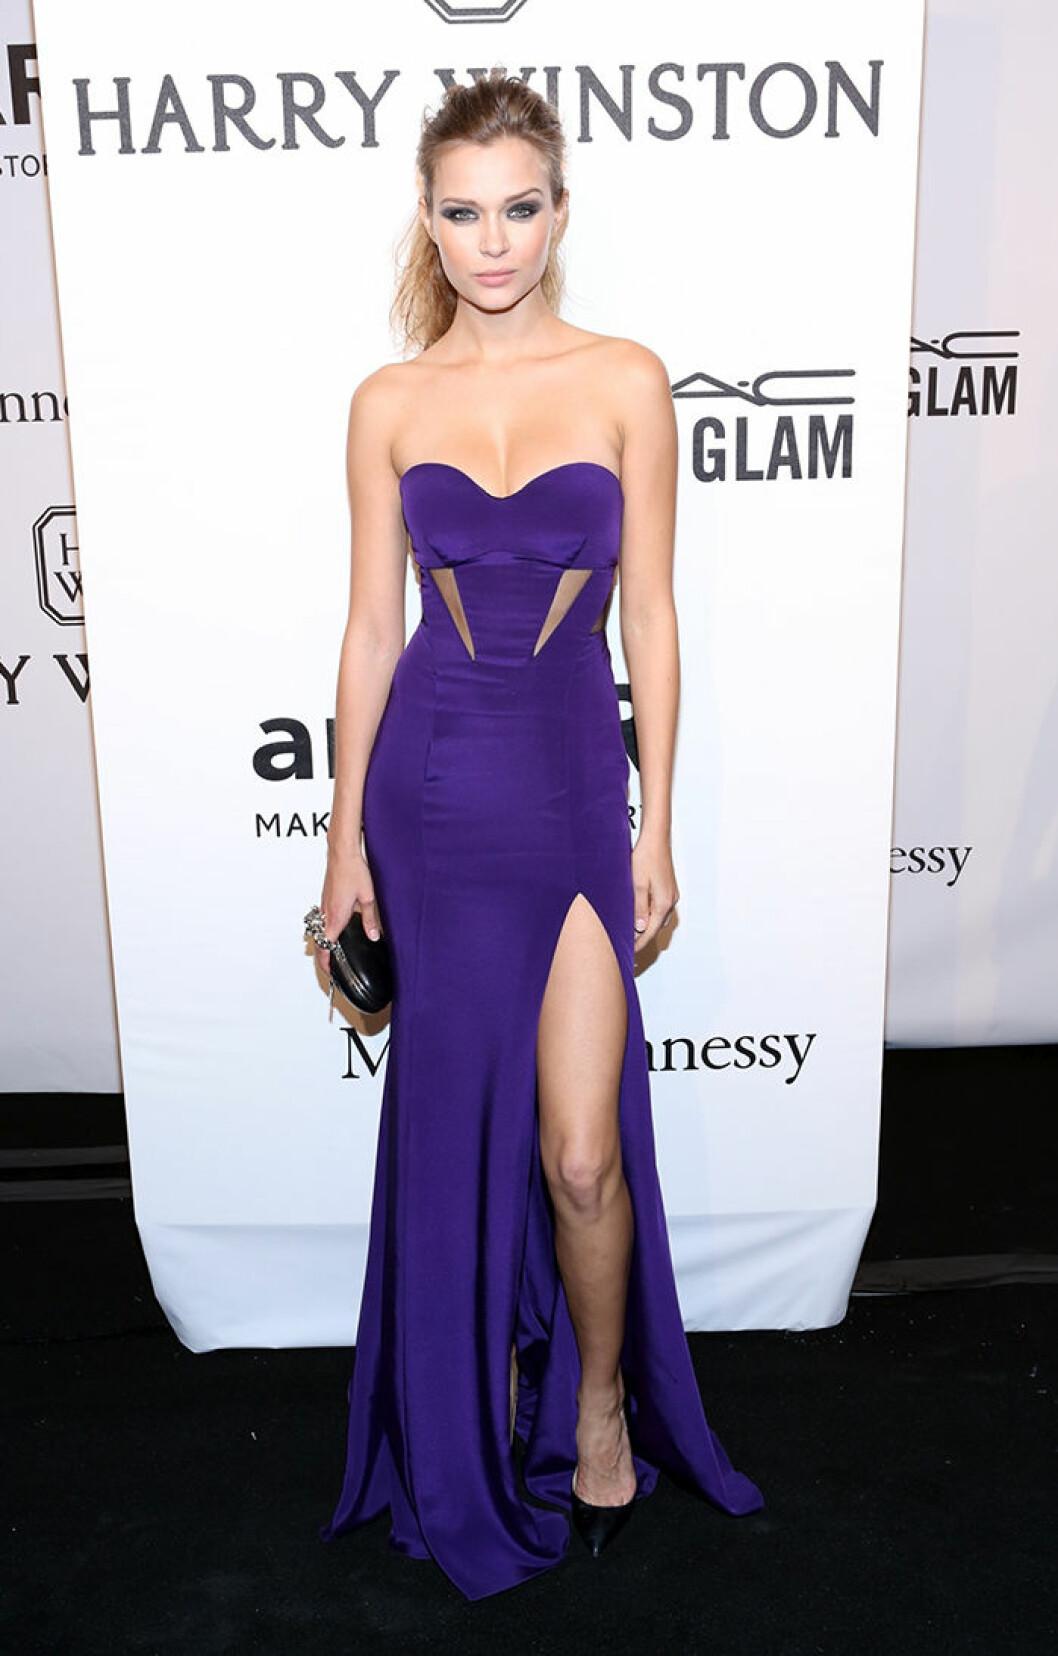 Josephine Skriver seen attending the 2015 amfAR New York Gala at Cipriani Wall Street